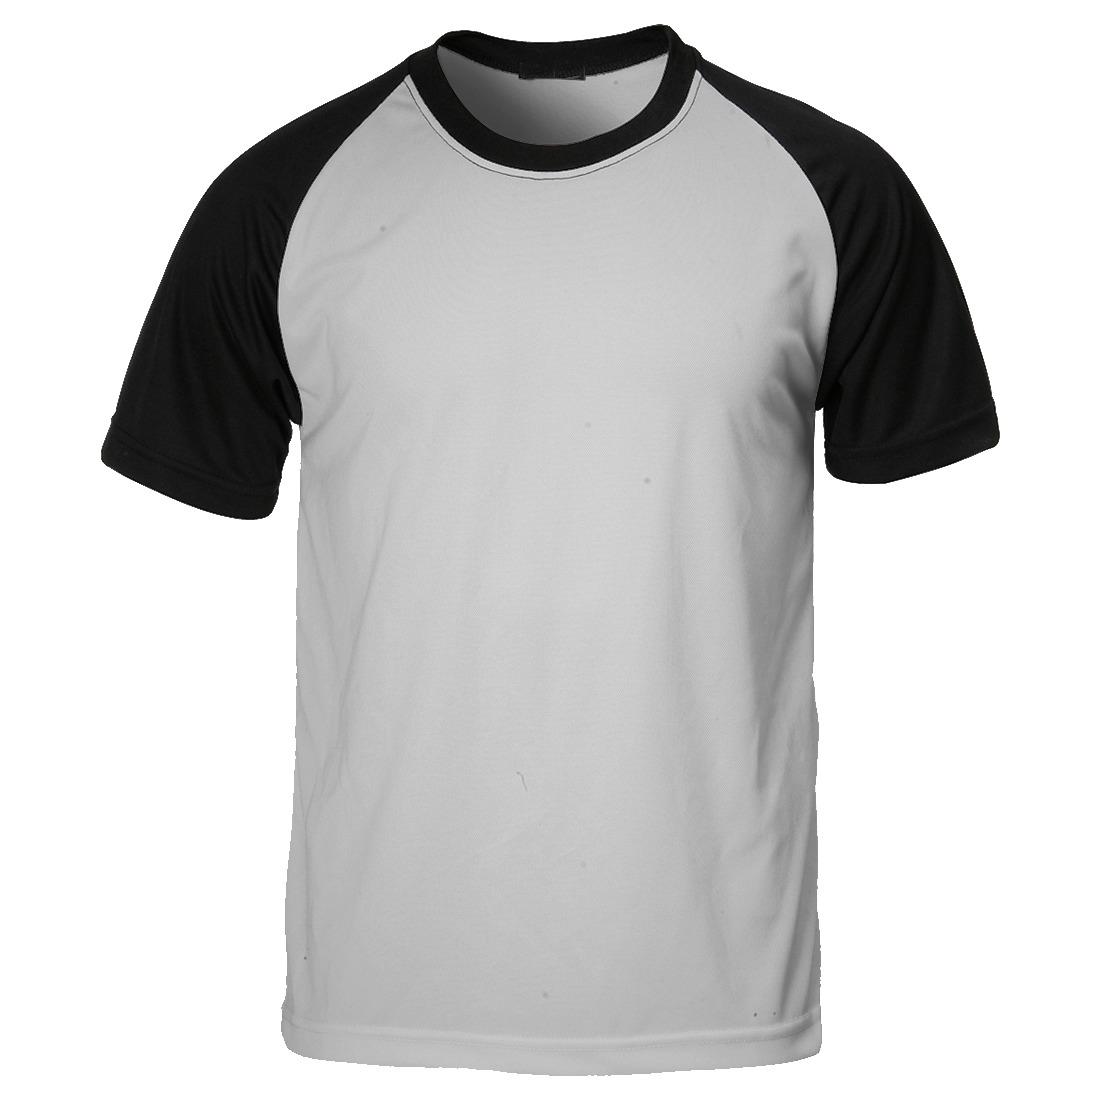 d9eefa449827f camiseta personalizada raglan manga curta frente e verso. Carregando zoom.